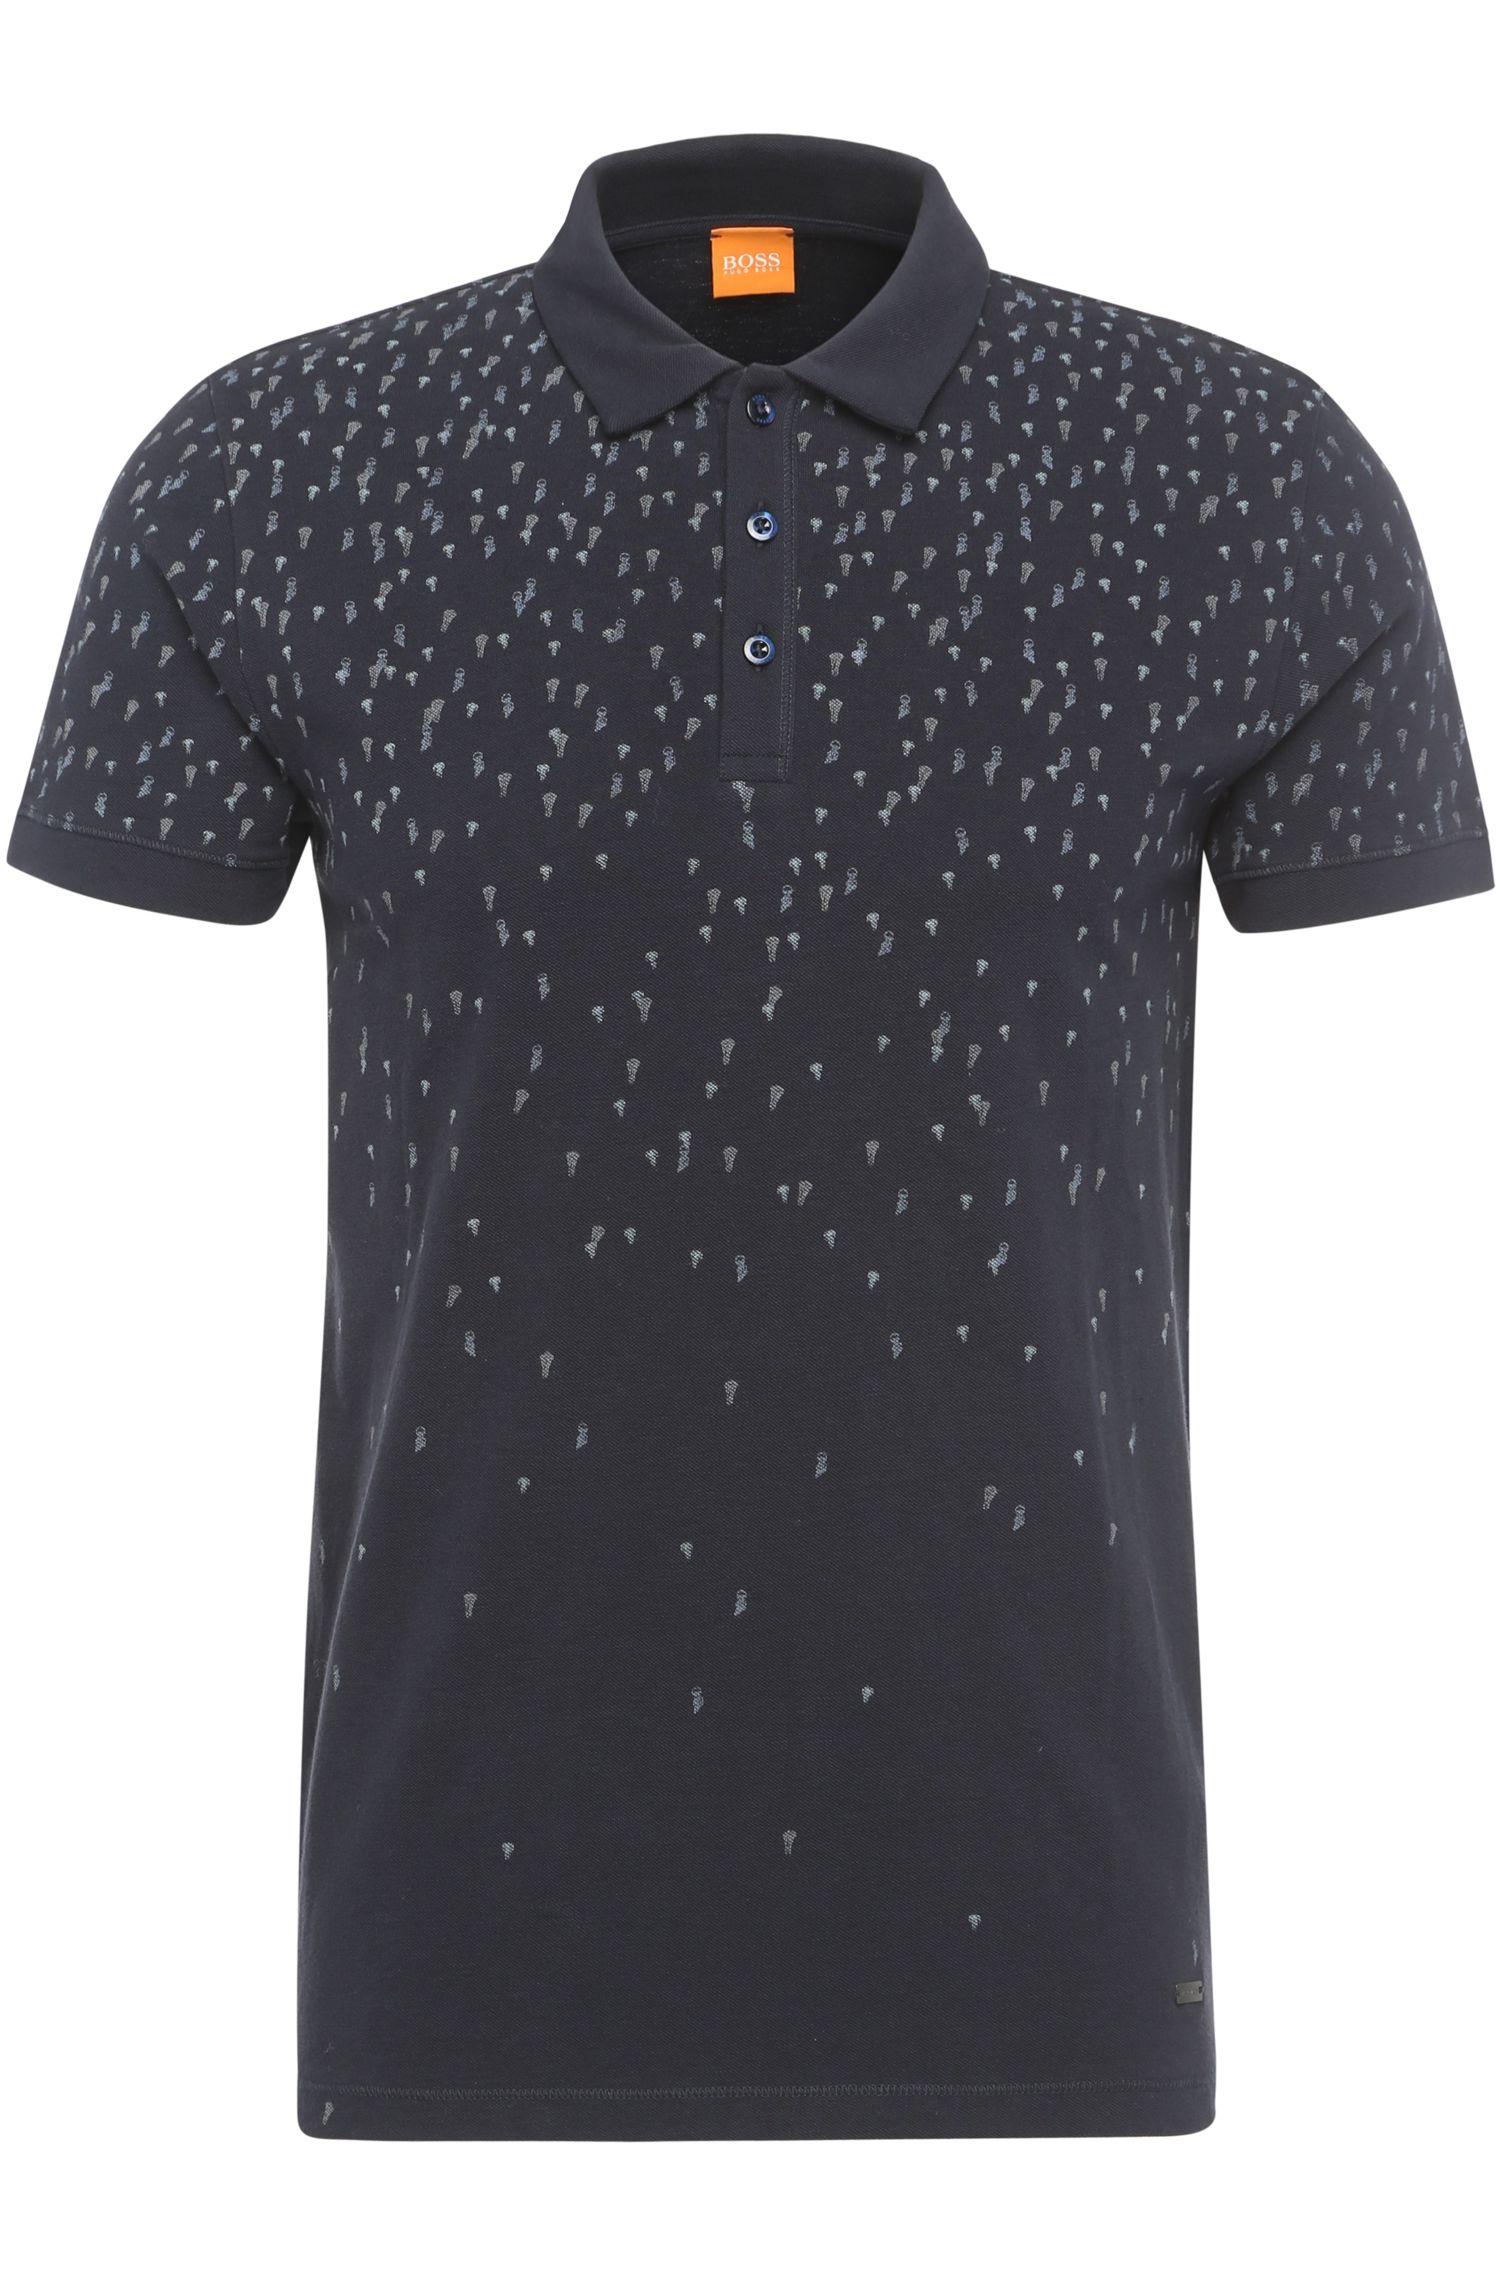 'Portt' | Slim Fit, Cotton Polo Shirt